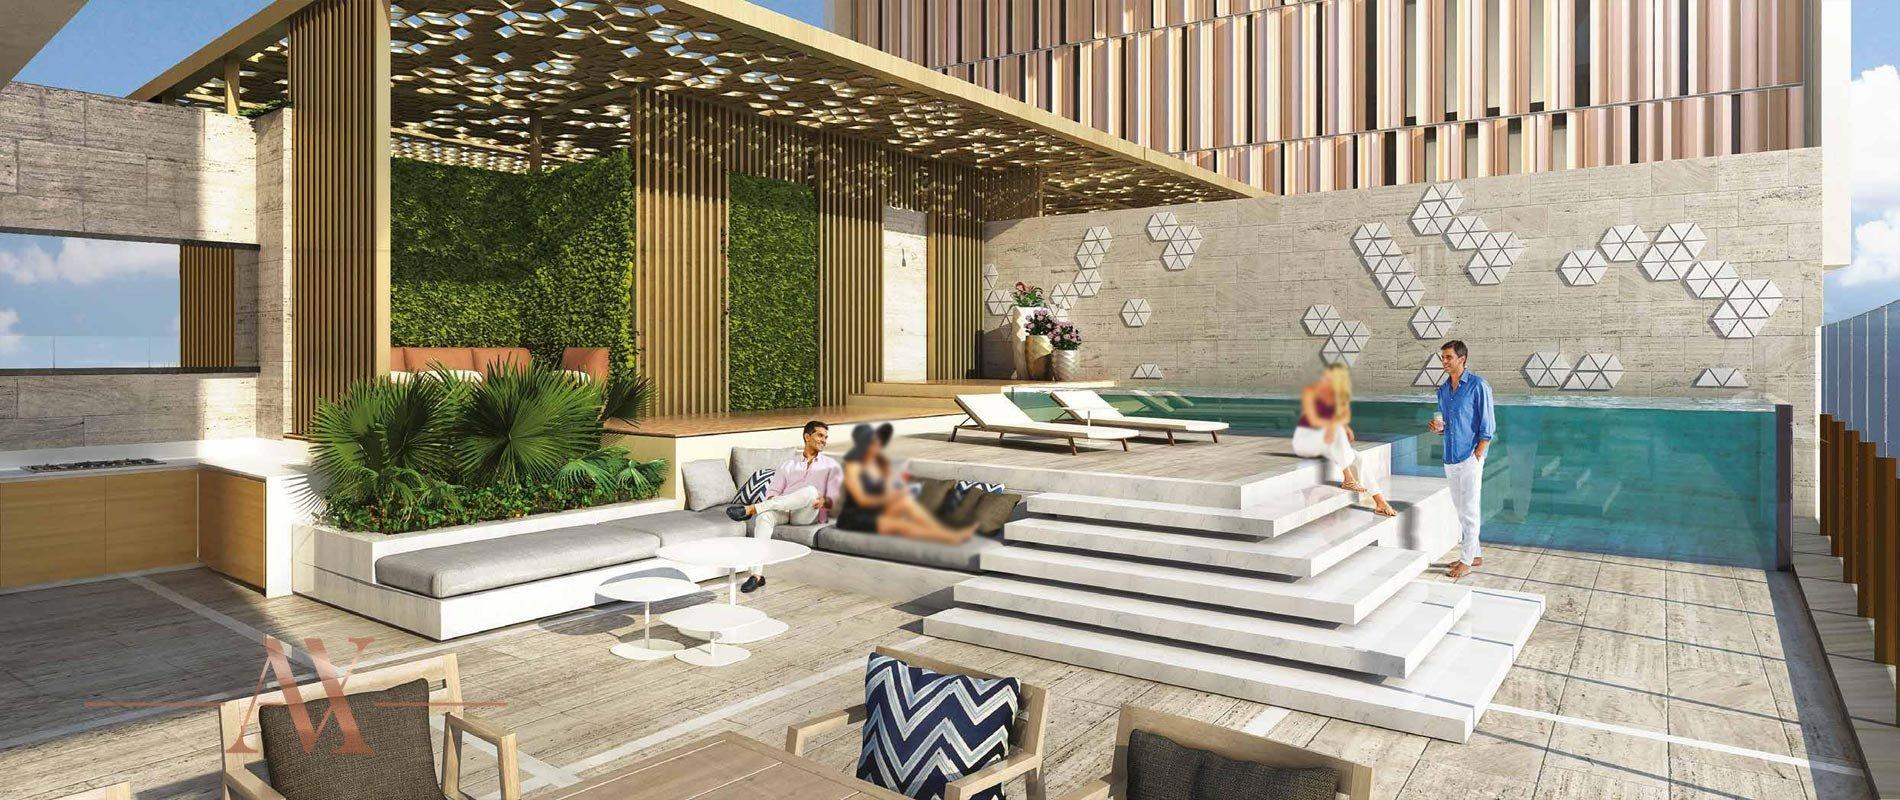 ROYAL ATLANTIS RESORT & RESIDENCES, Palm Jumeirah, Dubai, EAU – foto 8